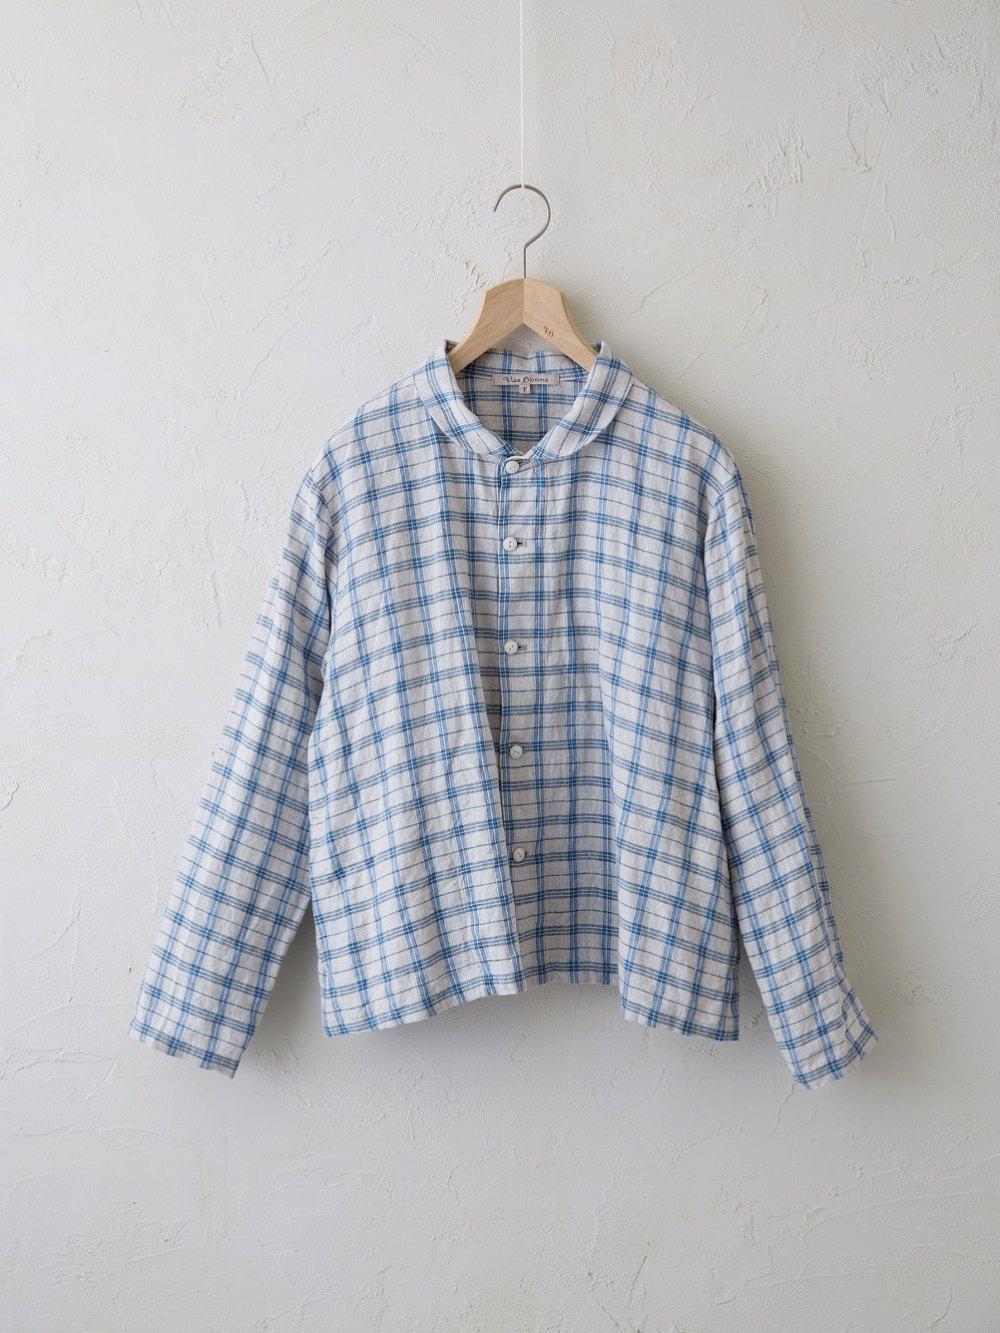 Vintage Check(平織) ライトジャケット